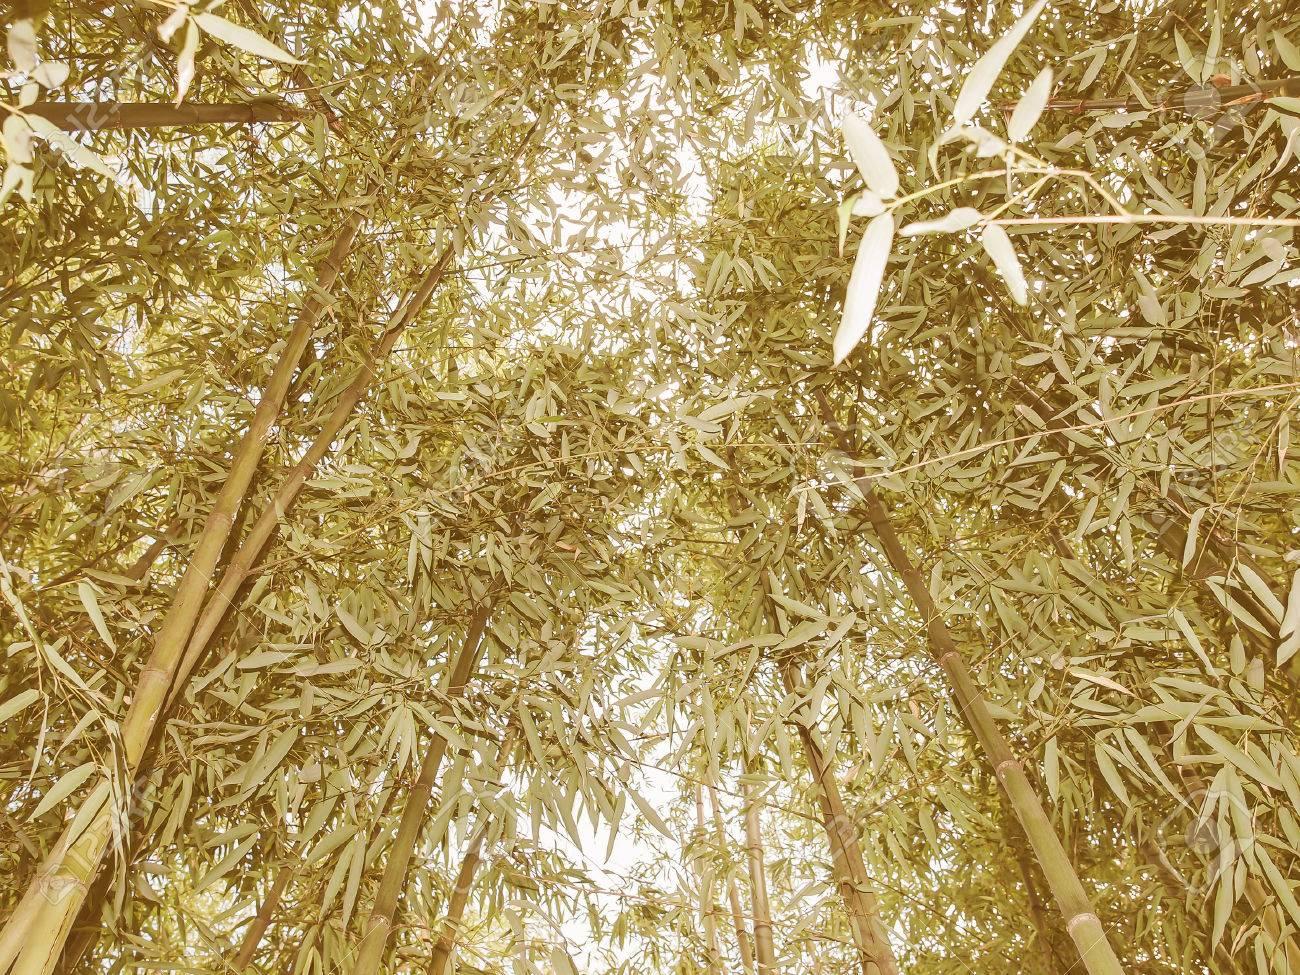 Vintage Looking Bamboo Flowering Perennial Evergreen Plants In